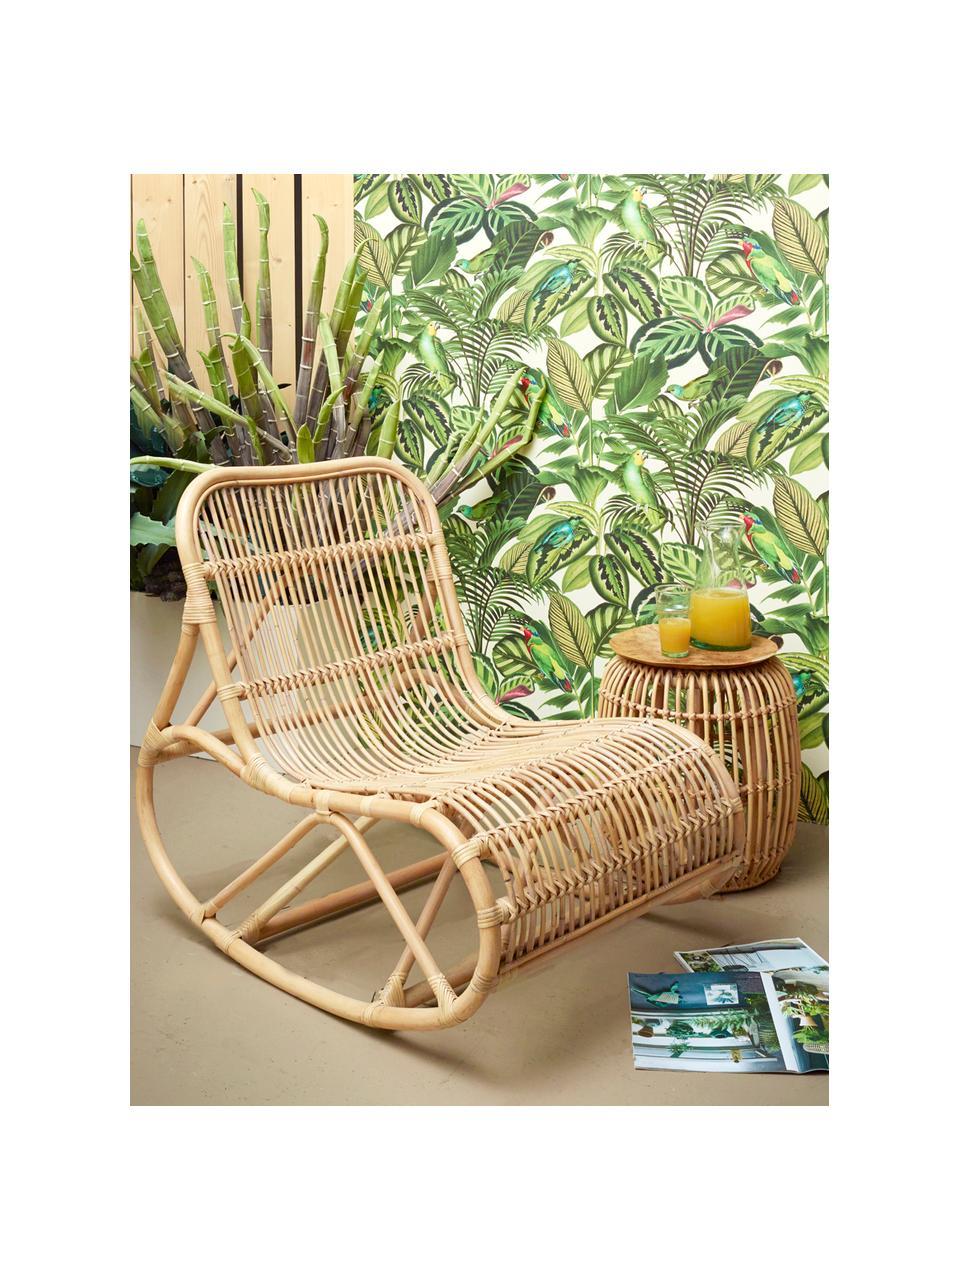 Rotan schommelstoel Kim, Rotan, naturel, Rotan, B 62 x D 90 cm